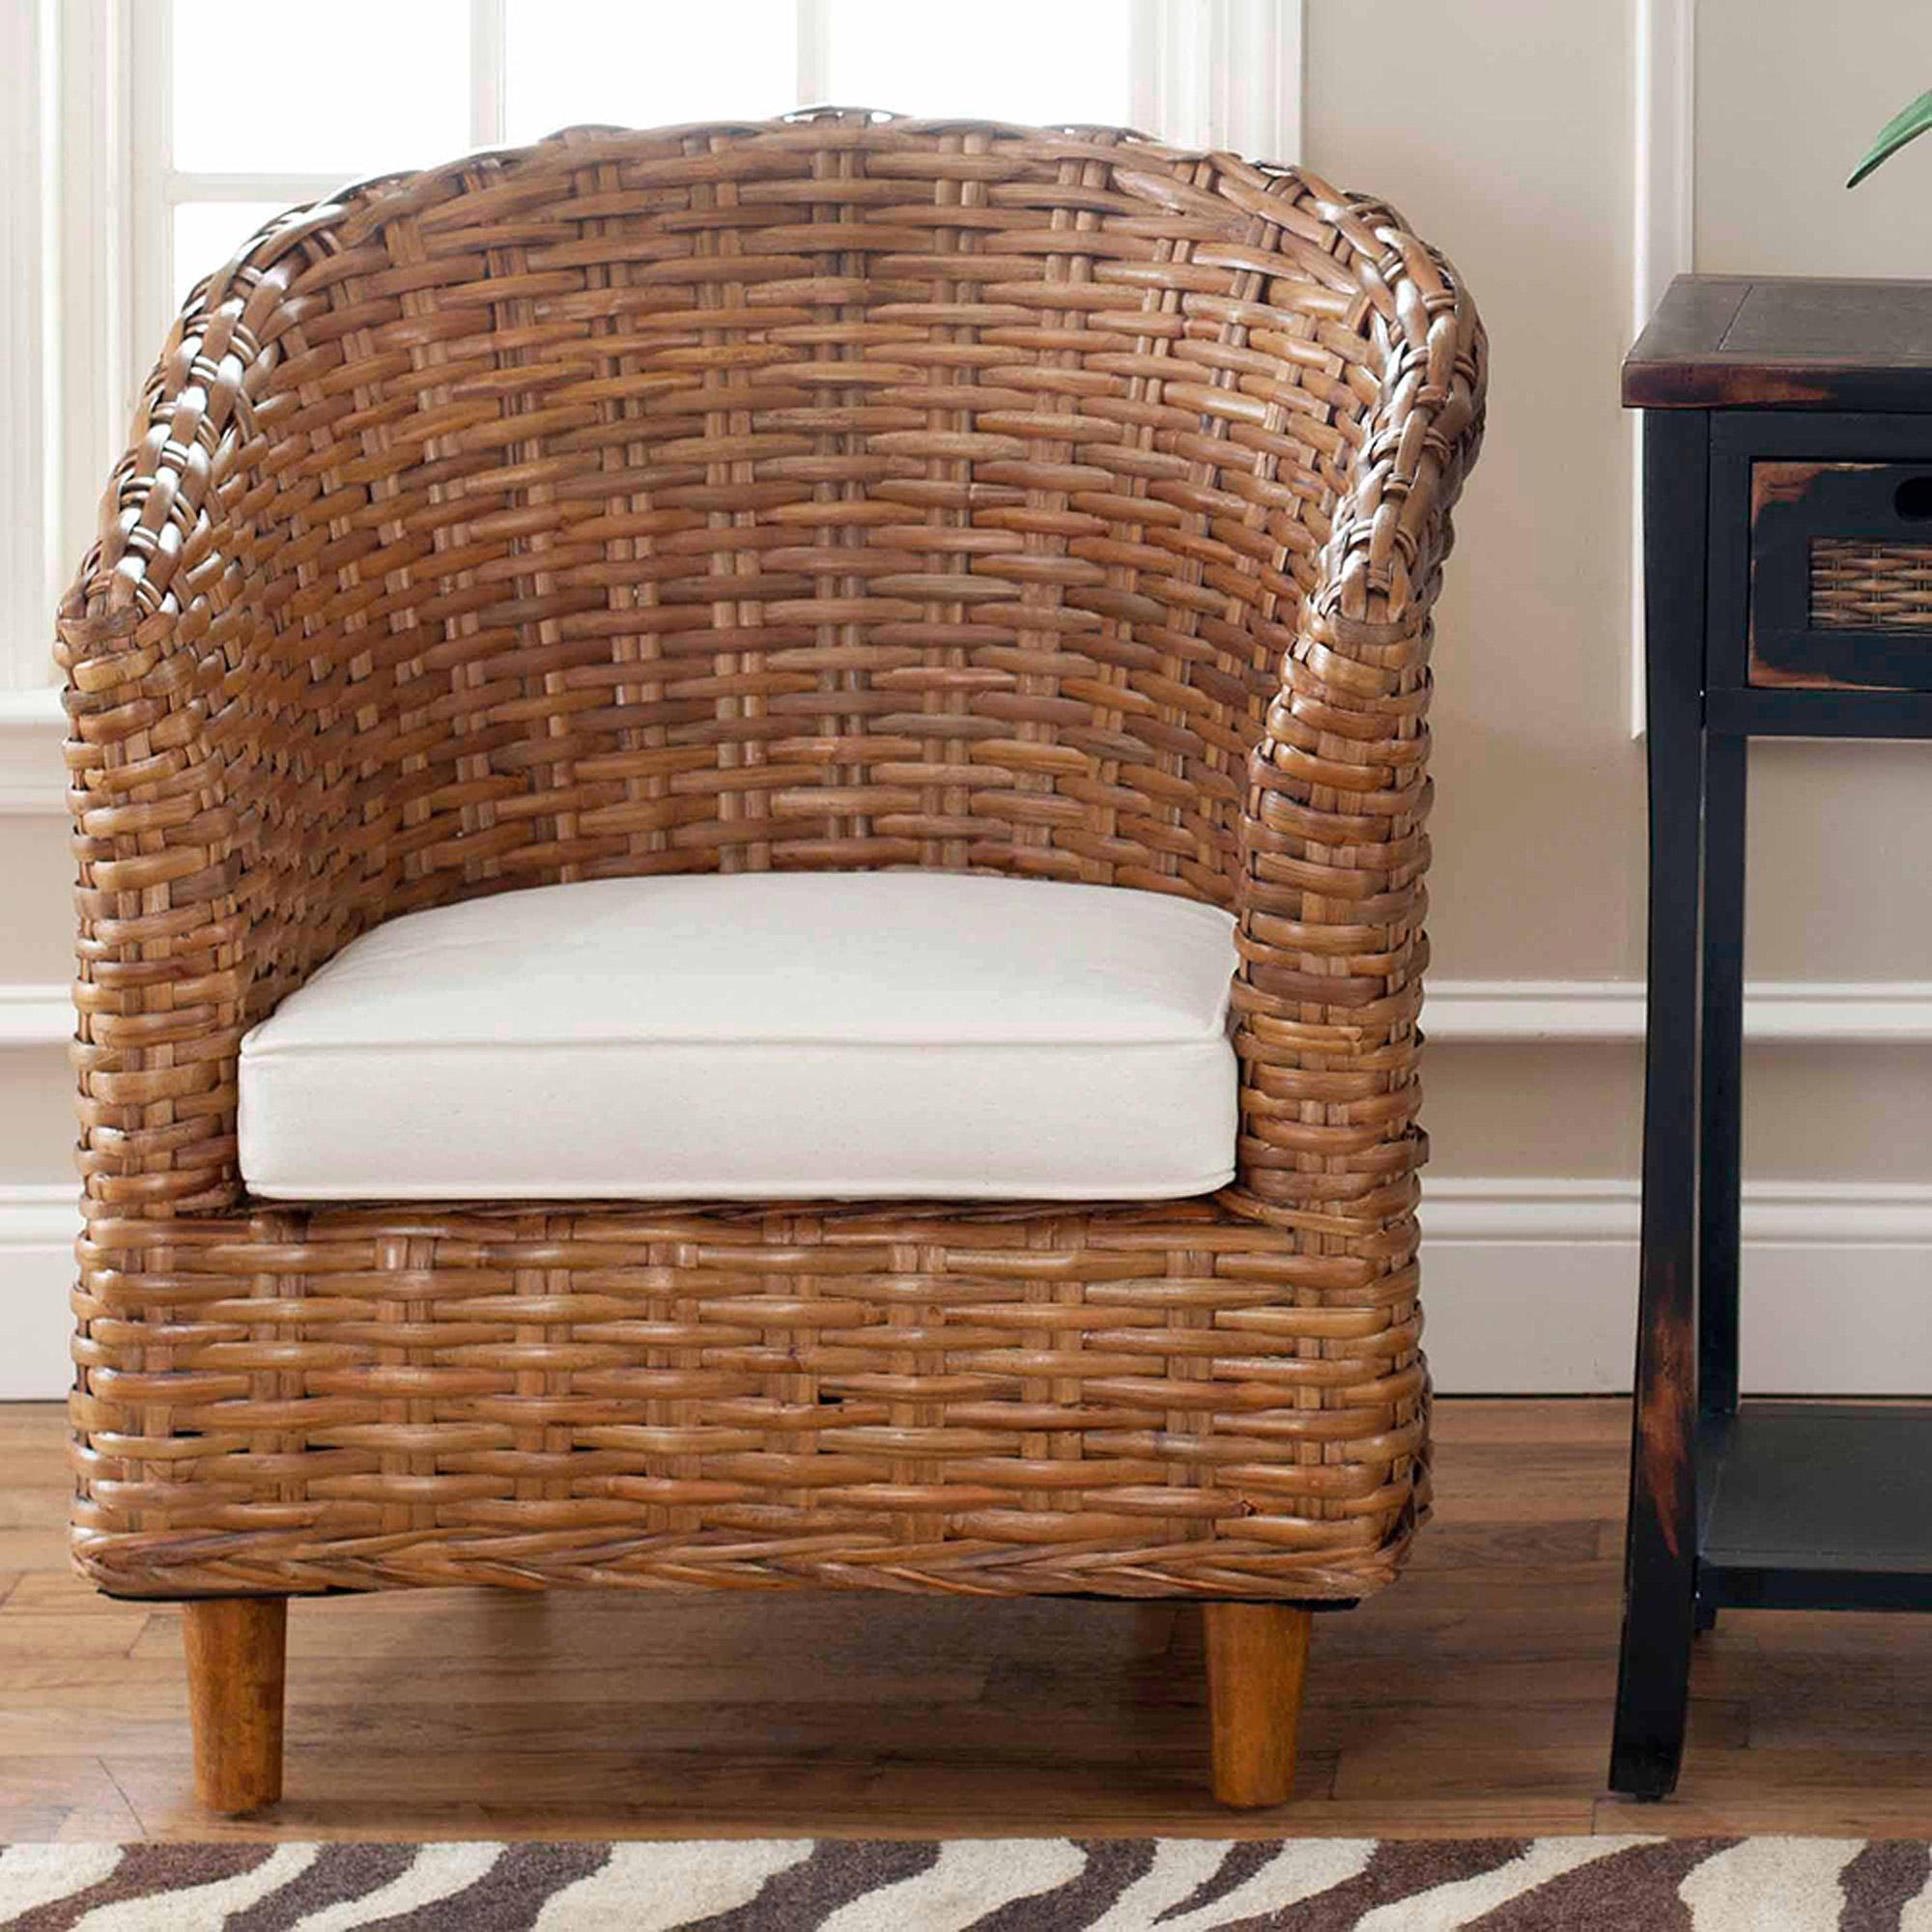 Safavieh Home Collection Ella Honey Oak Wicker Barrel Chair